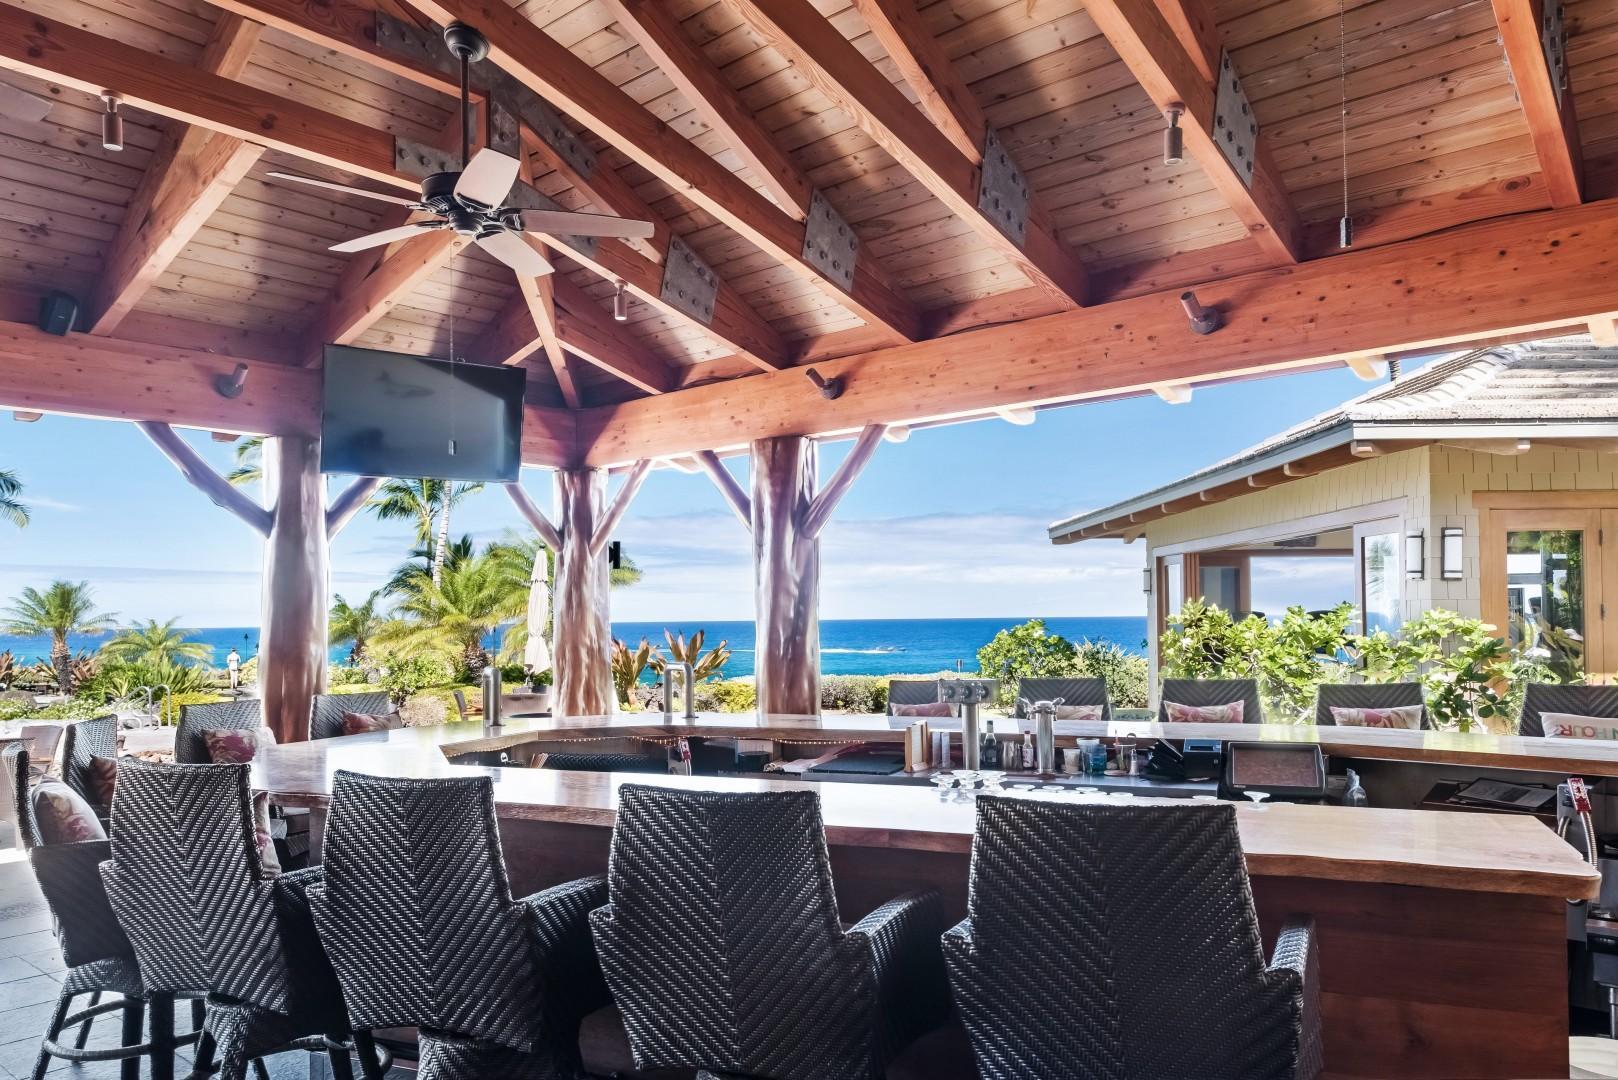 A bar with a view! Hali'i Kai Resort's private Ocean Club Bar & Grille